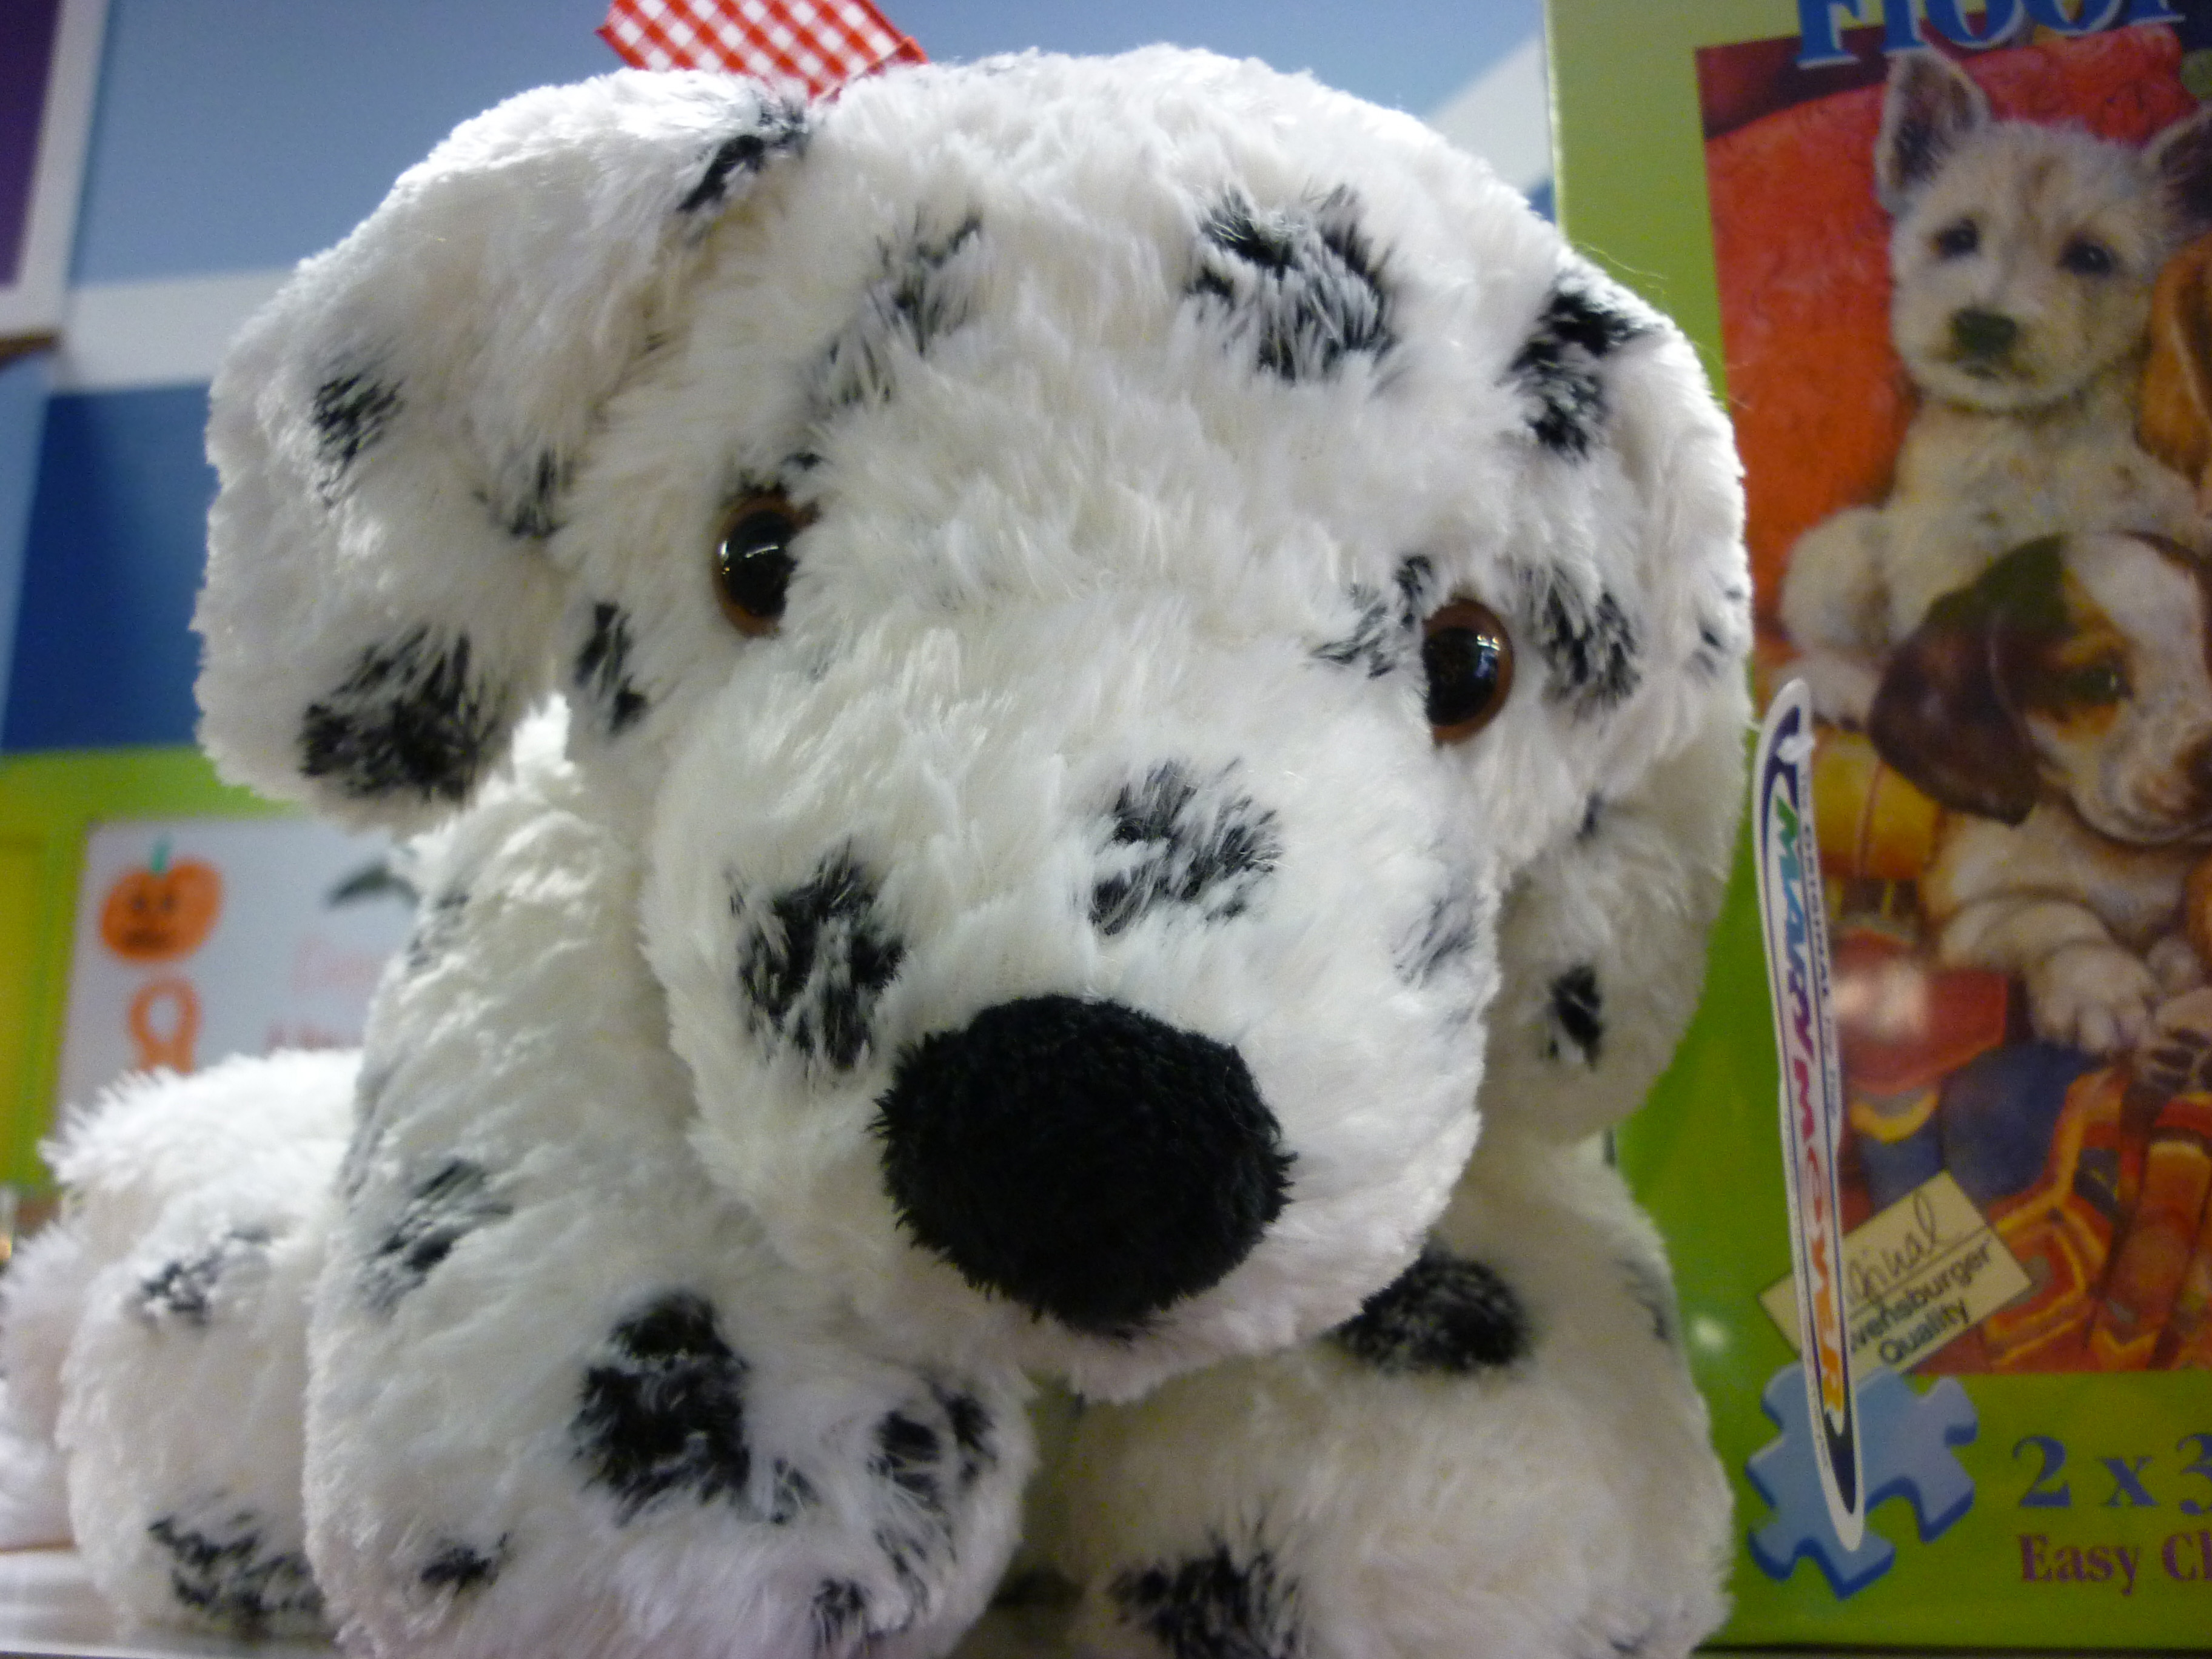 Mount-Vernon-WA-toy-store-doggie-04